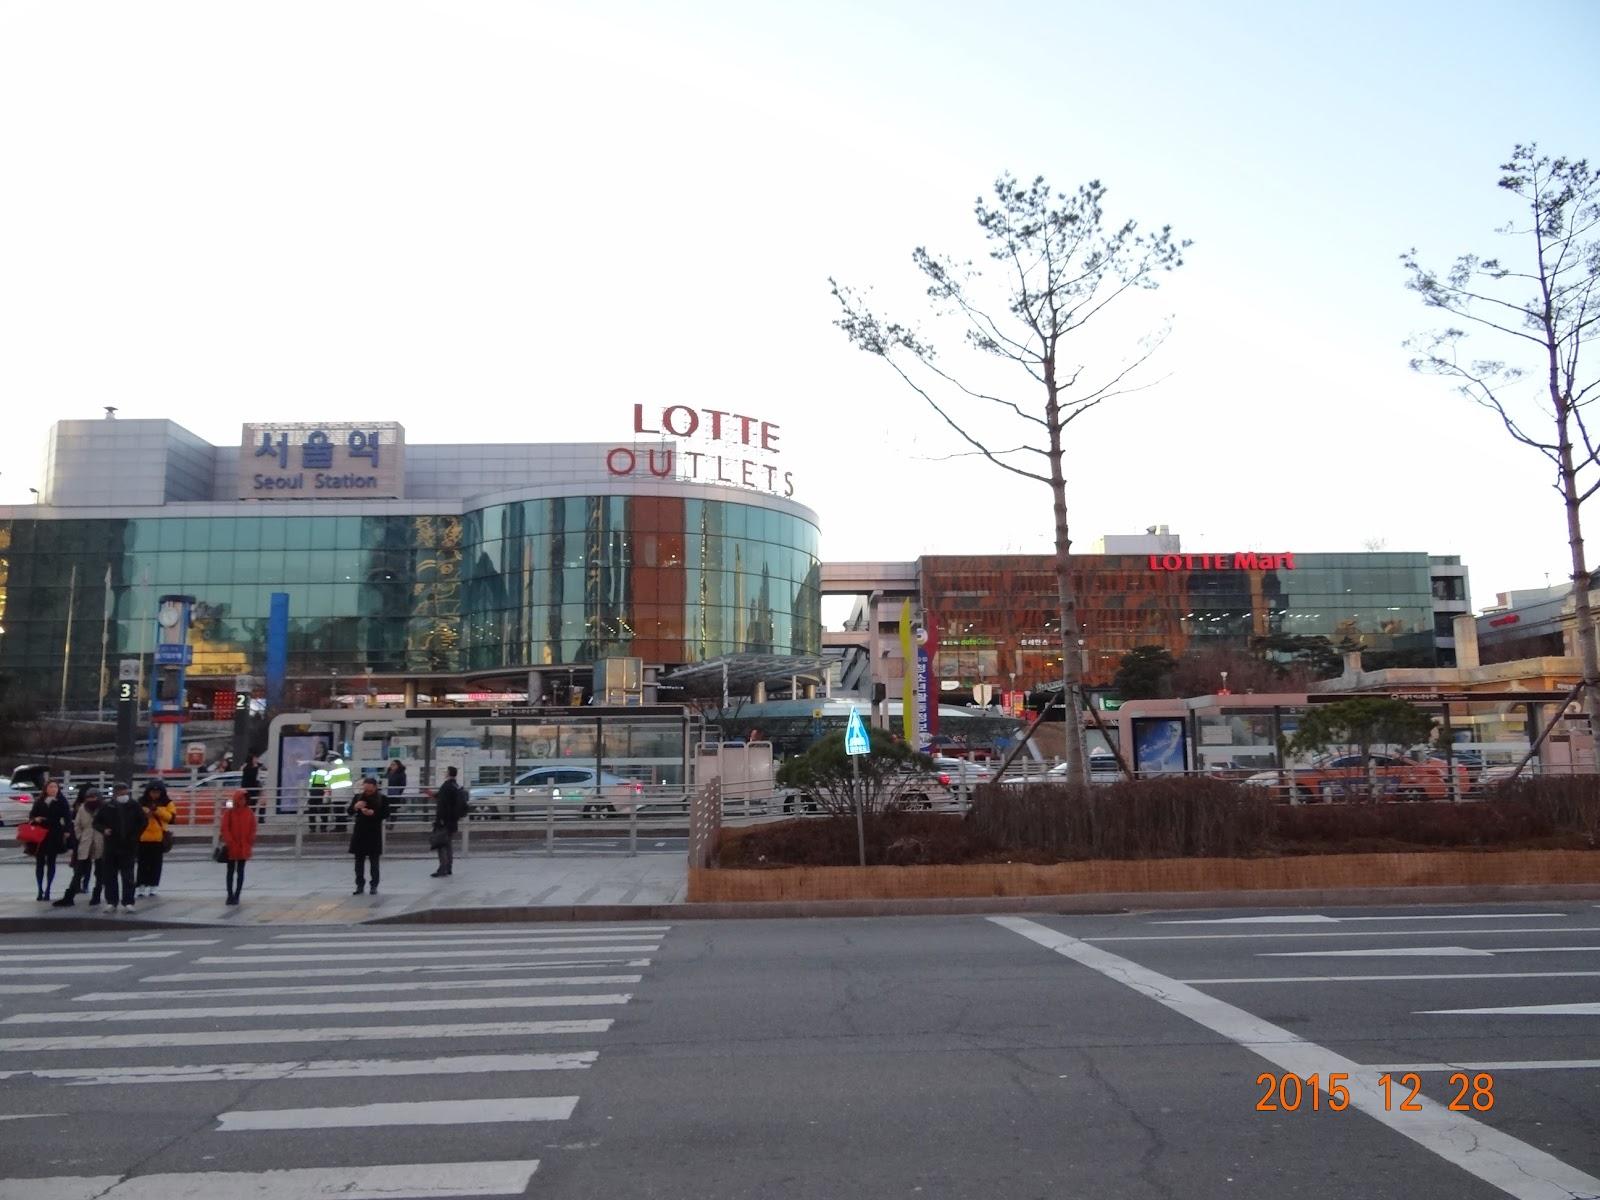 H&D幸福小屋: 首爾跨年自由行(21)首爾樂天outlets(롯데아울렛)、樂天超市首爾站店(롯데마트 서울역점)